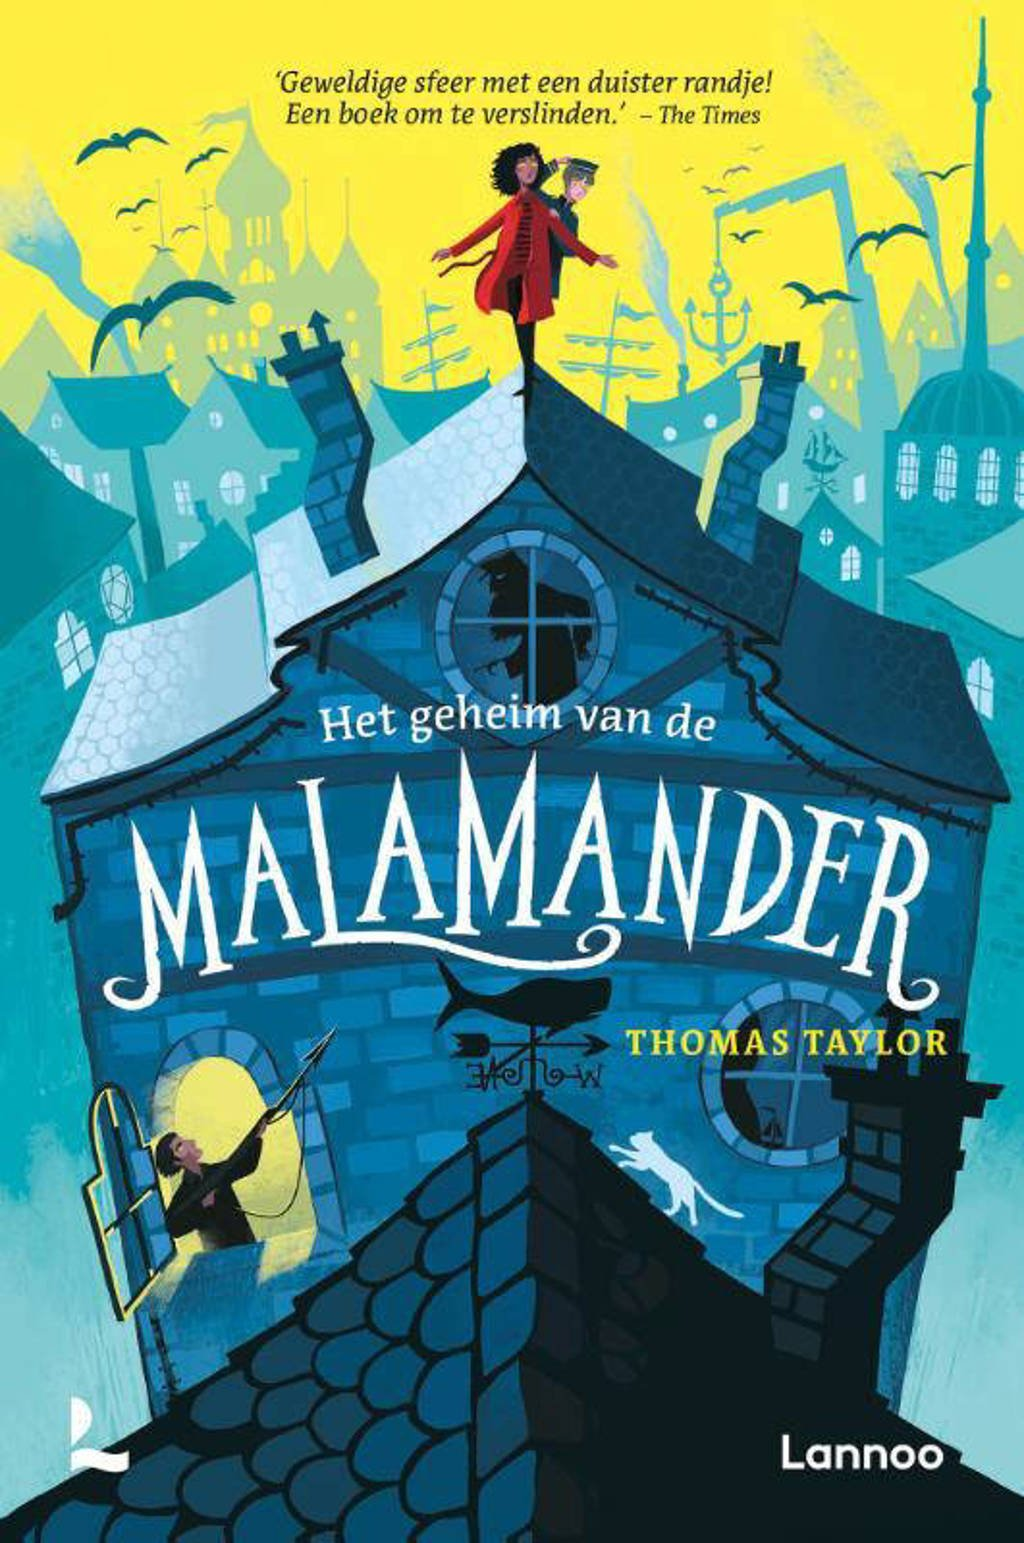 Het geheim van de malamander - Thomas Taylor